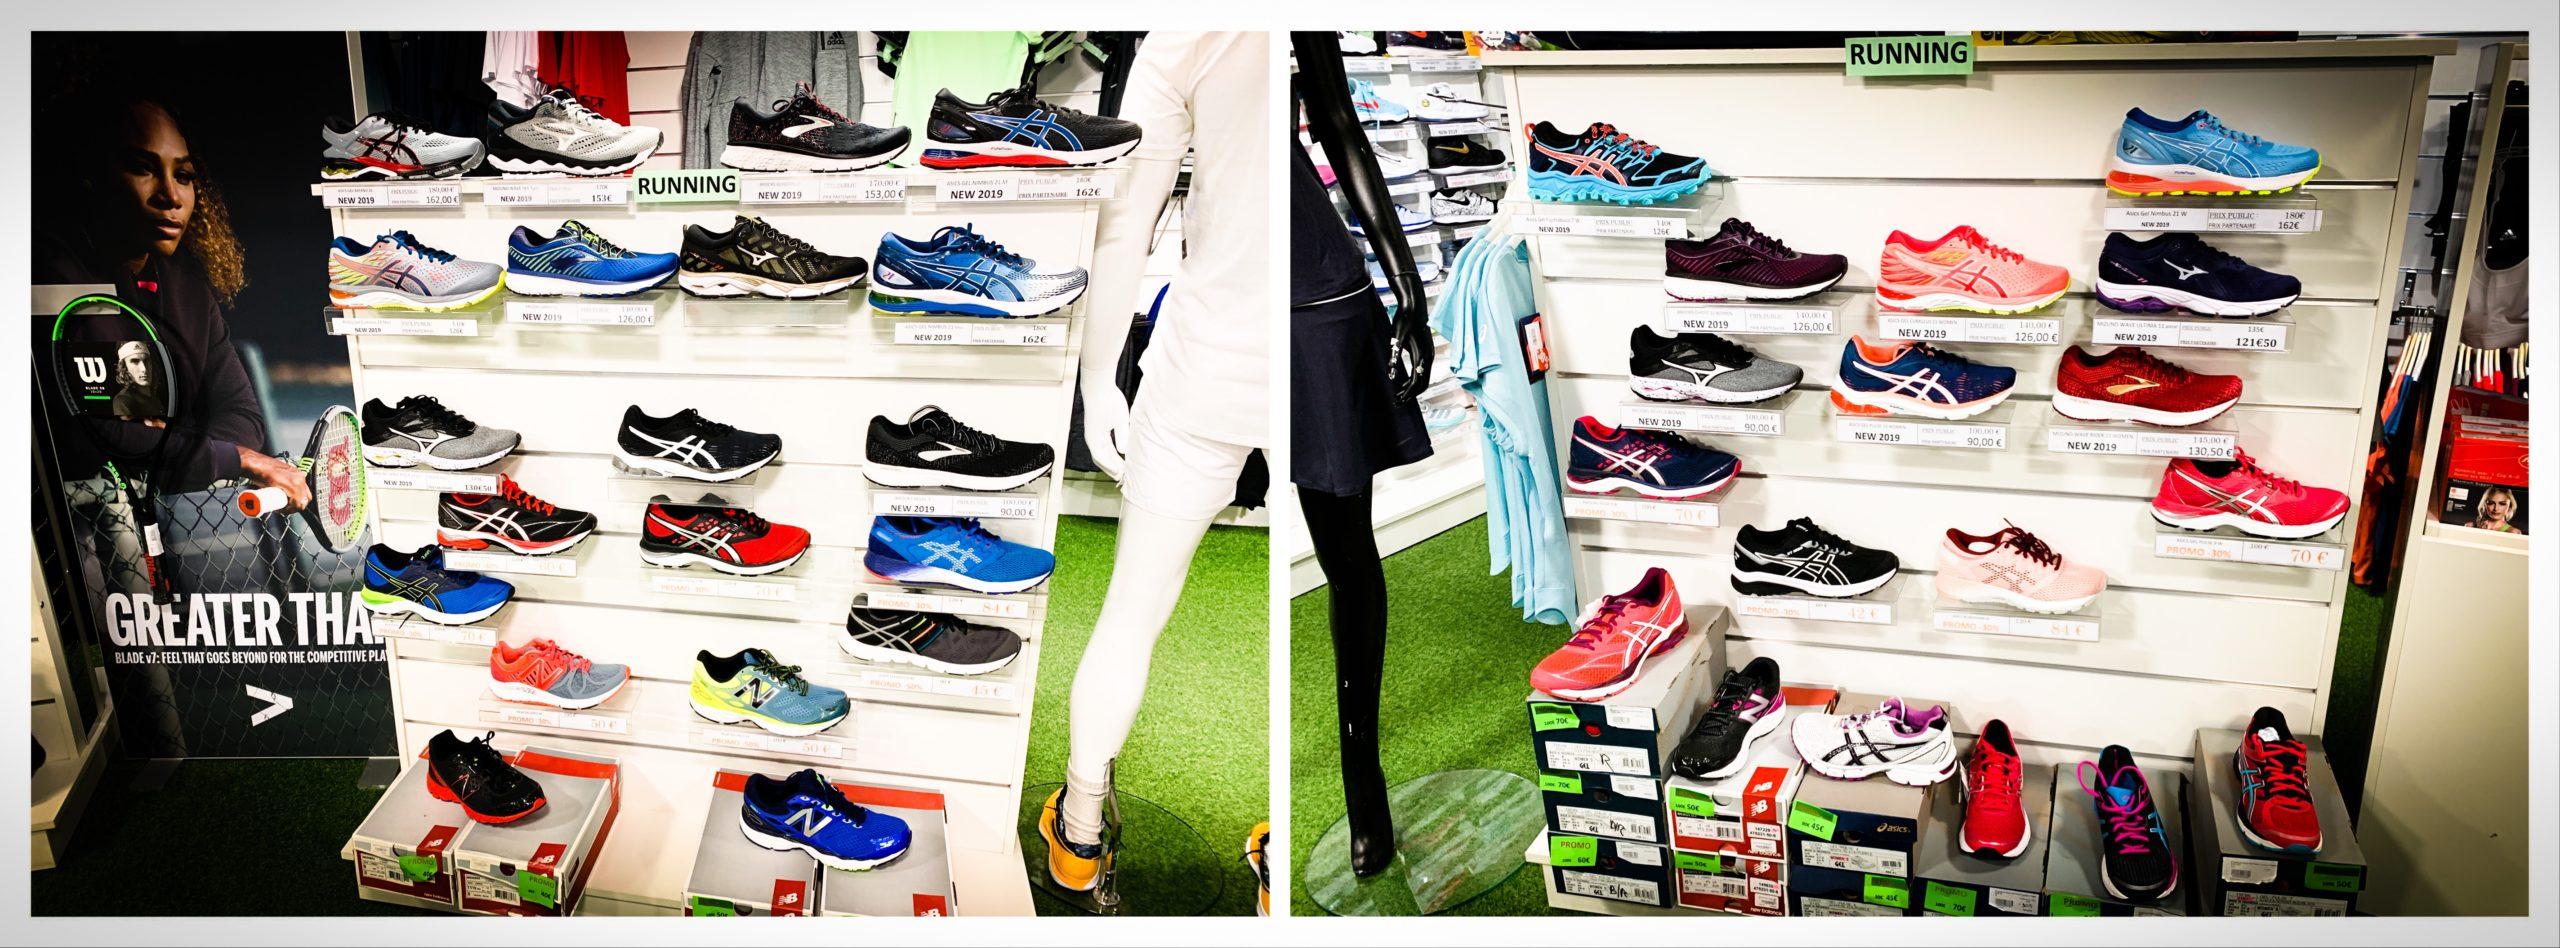 Boutique running Val d'oise chez Ecosport tennis